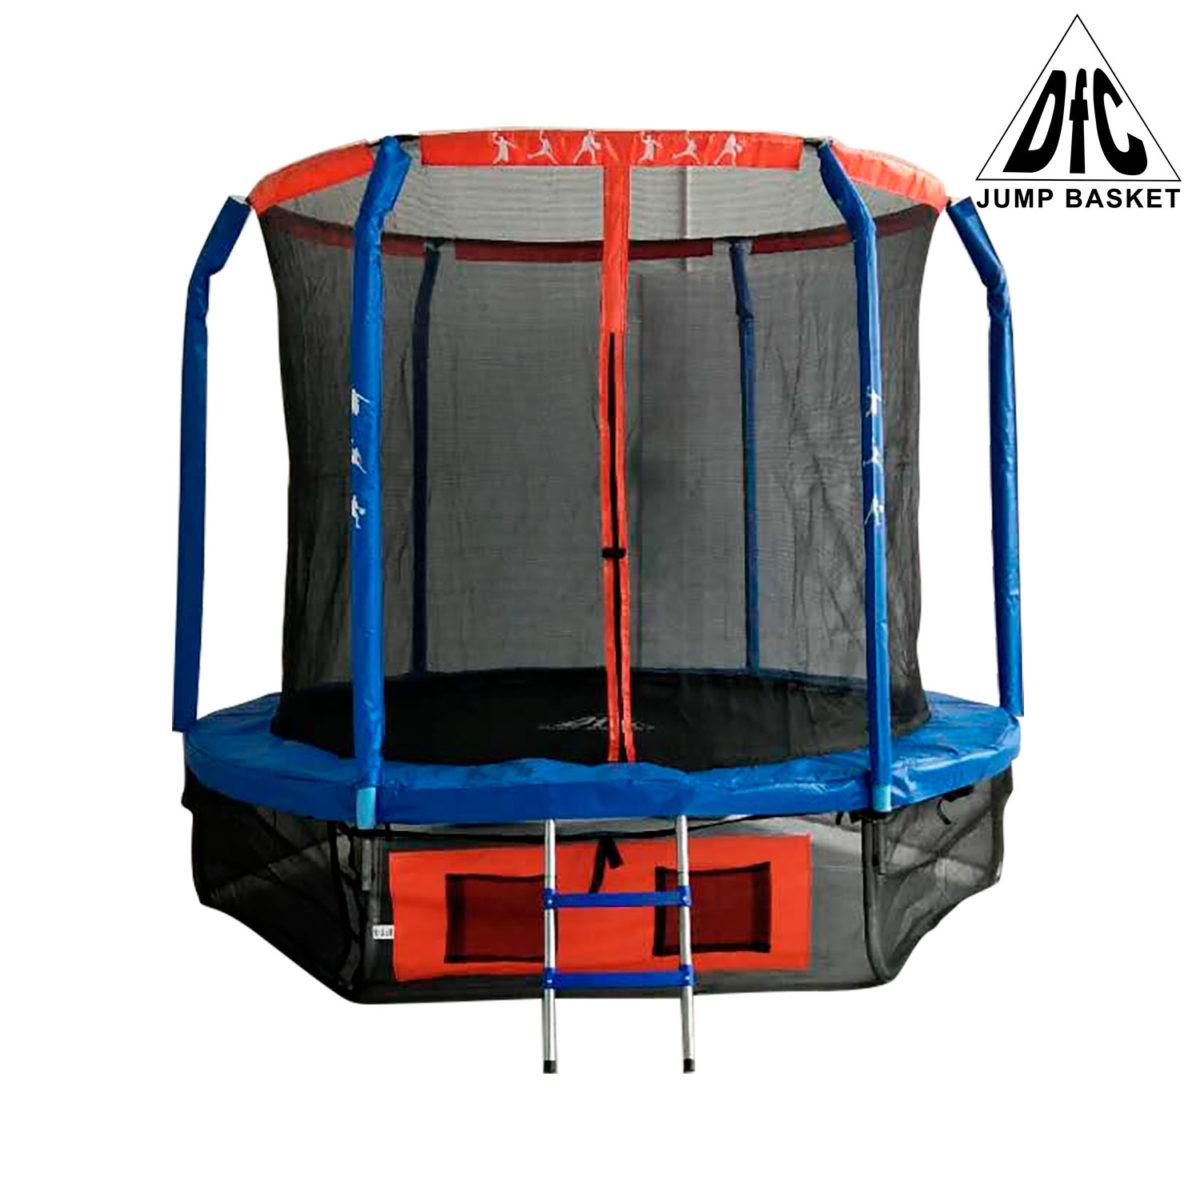 DFC Батут DFC JUMP BASKET с внутр. сеткой, лестница (244 см) - 1